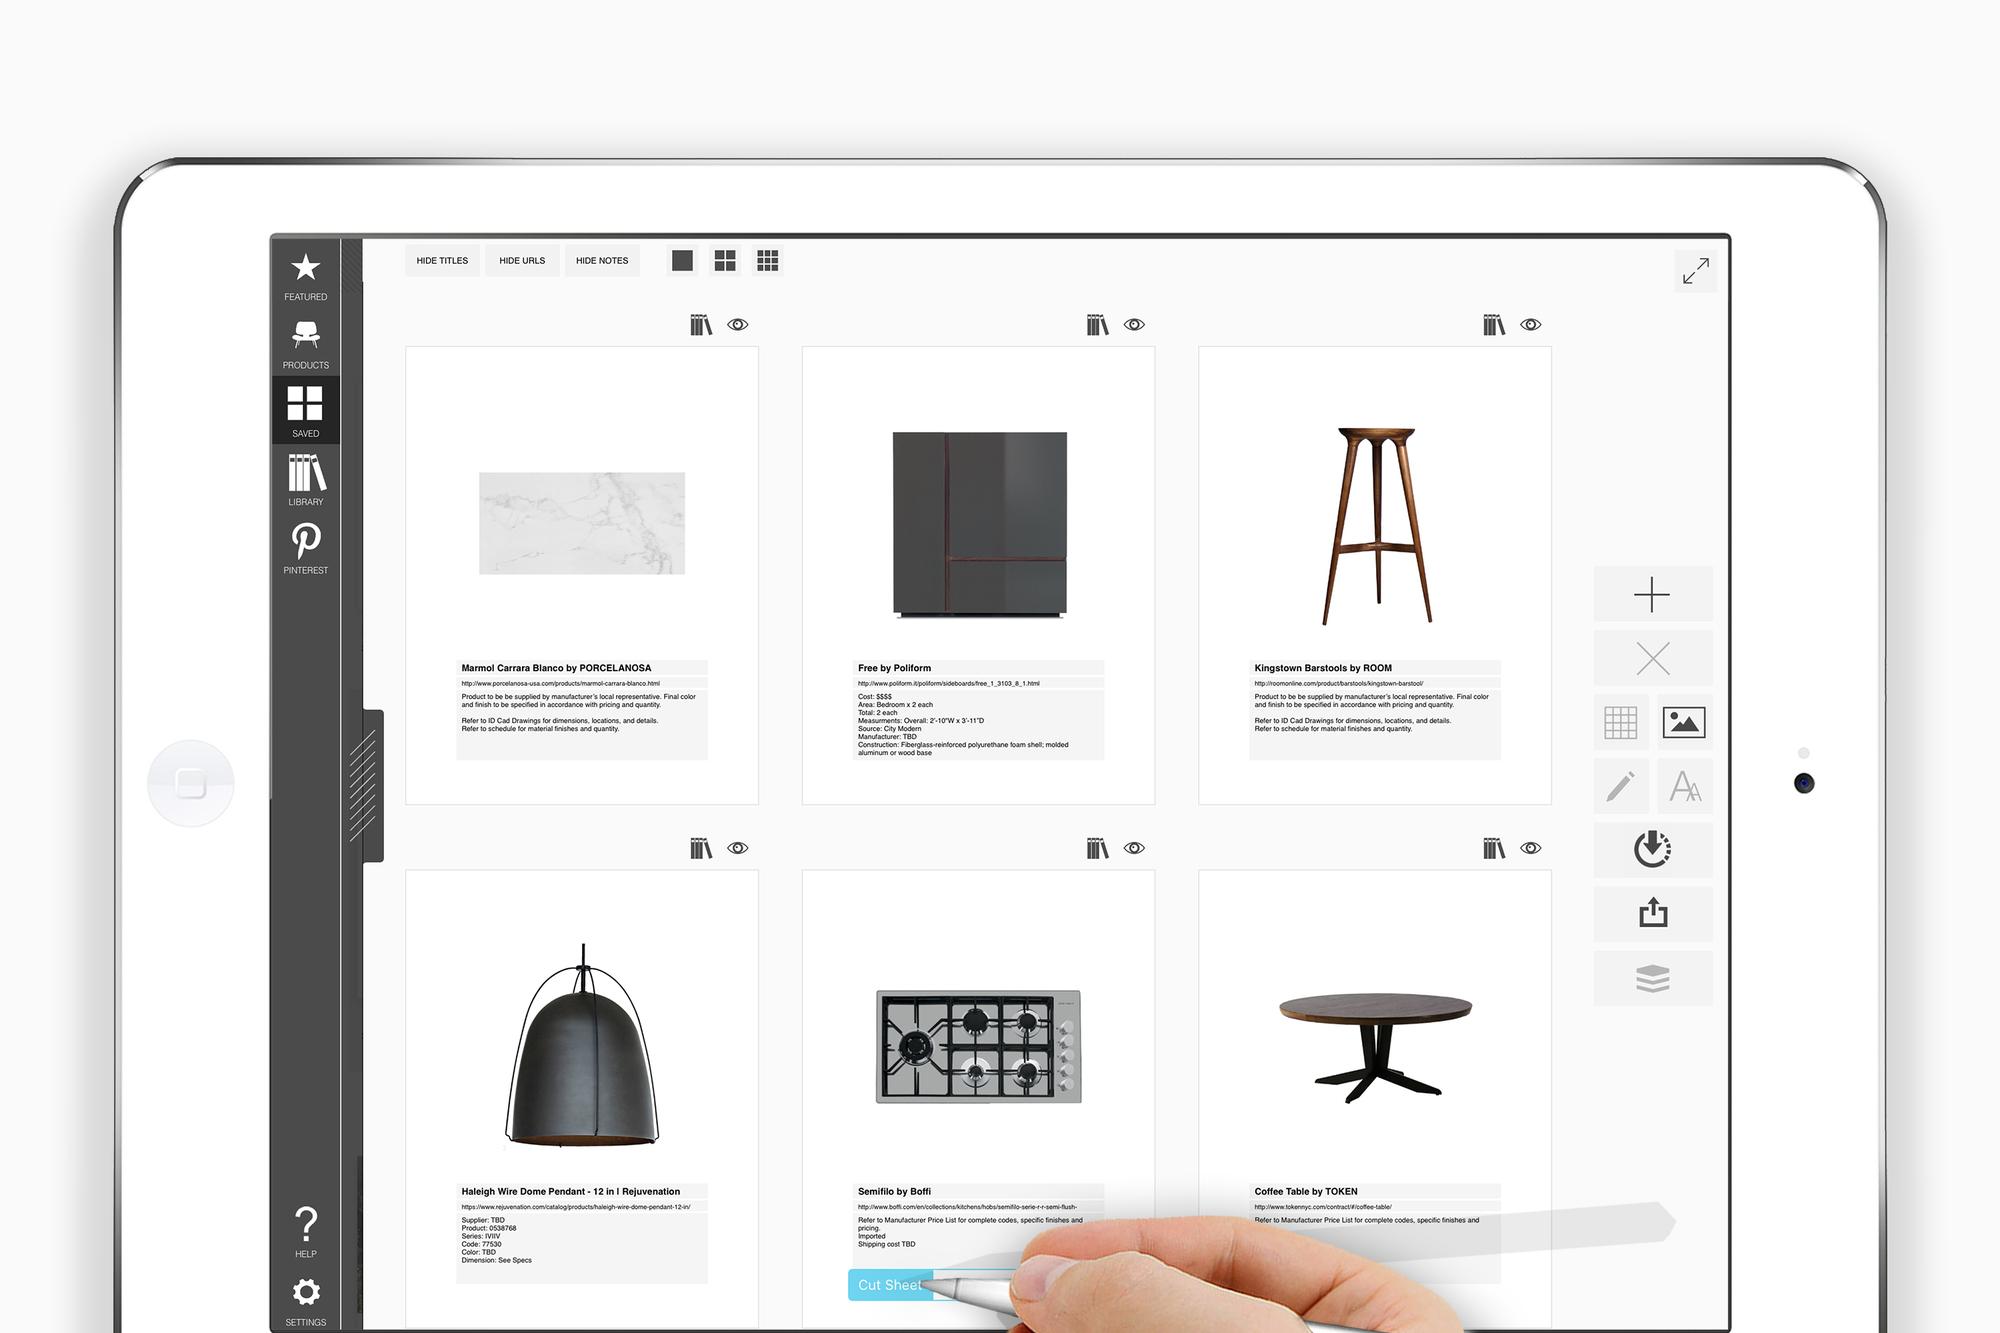 Gallery Of Meet Ava The App To Transform Interior Design 19,Easy Harley Davidson Nail Designs